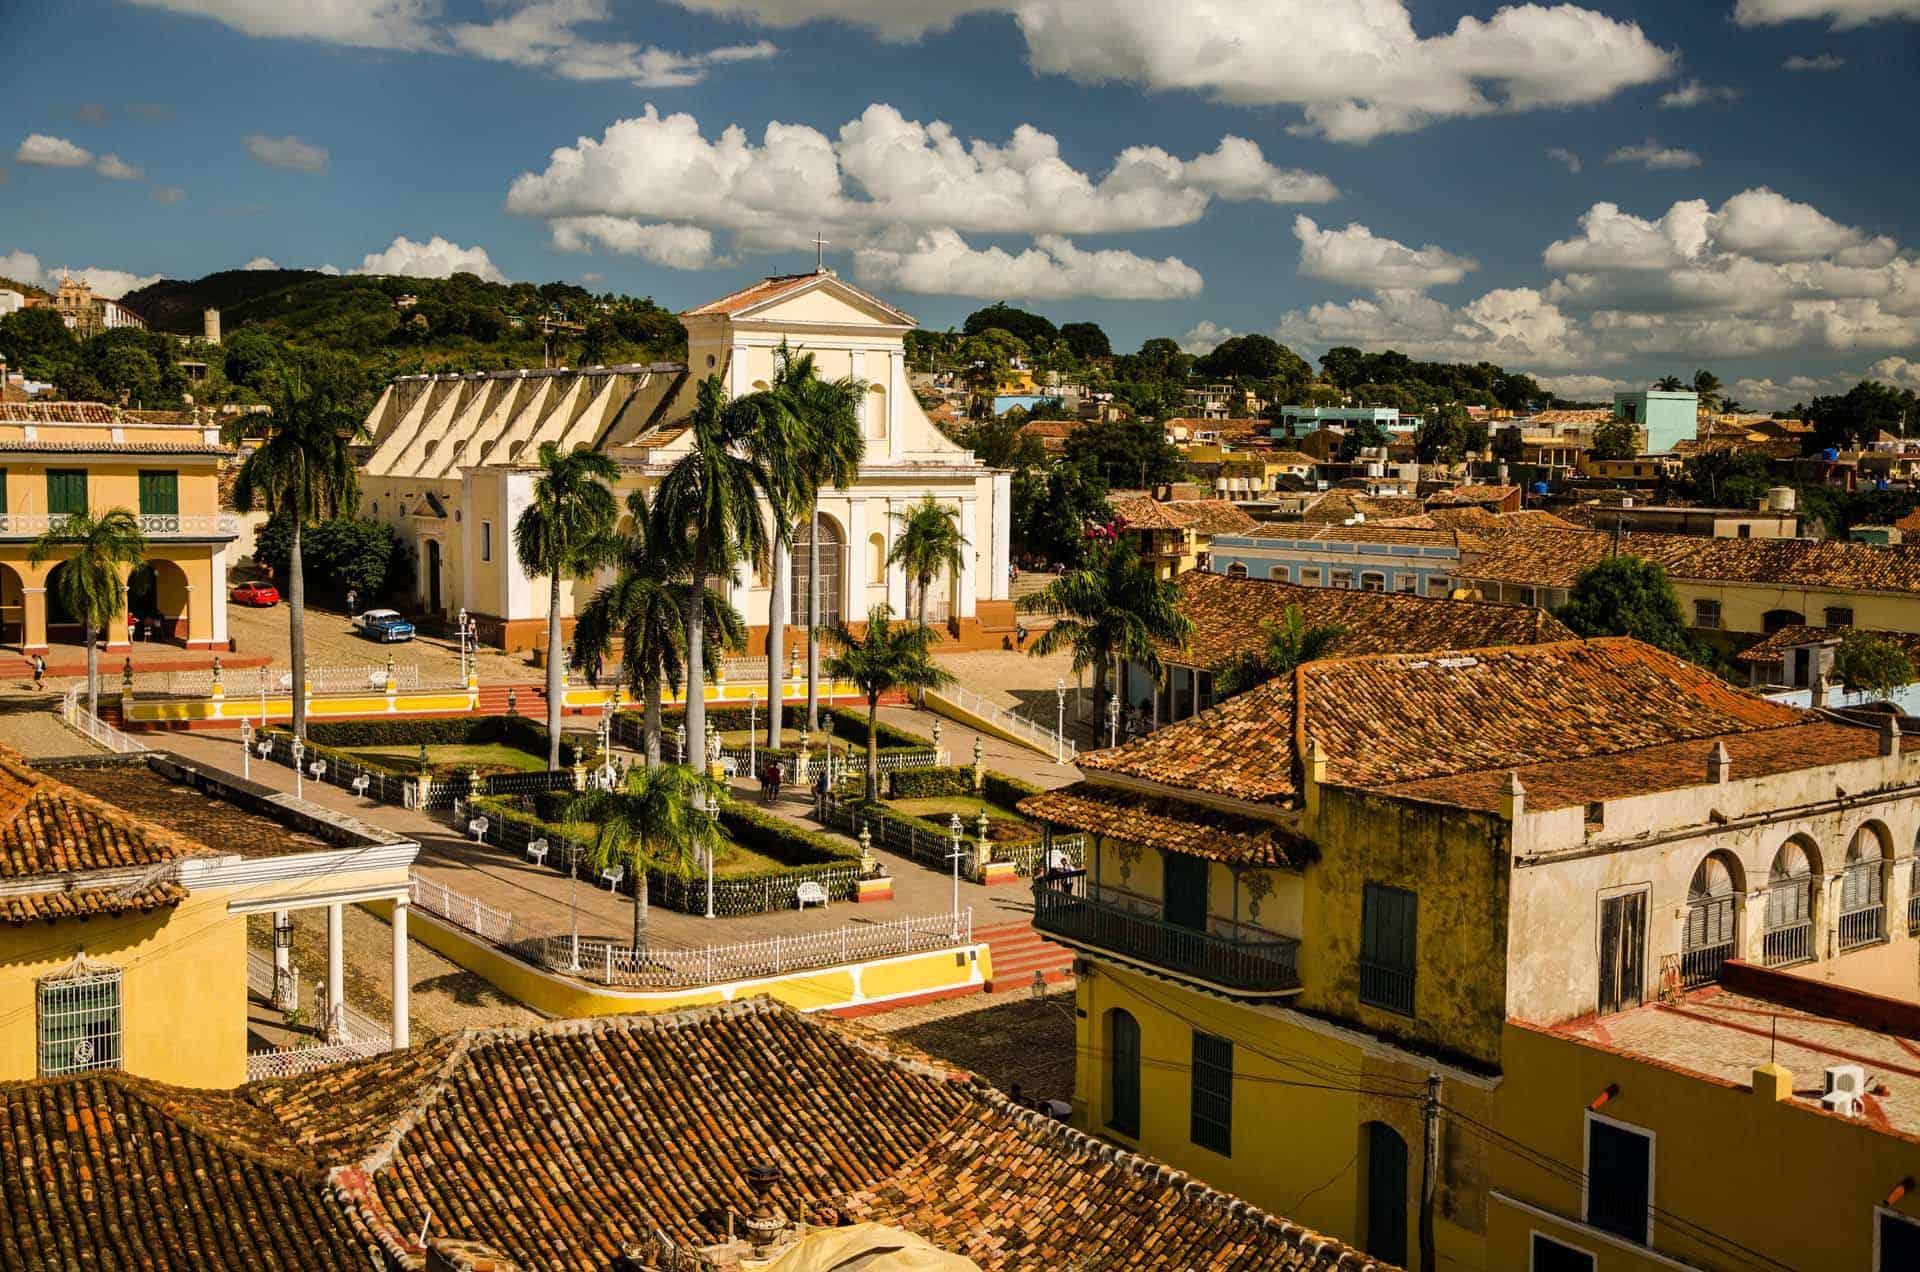 trinidad vue aerienne plaza mayor cuba autrement